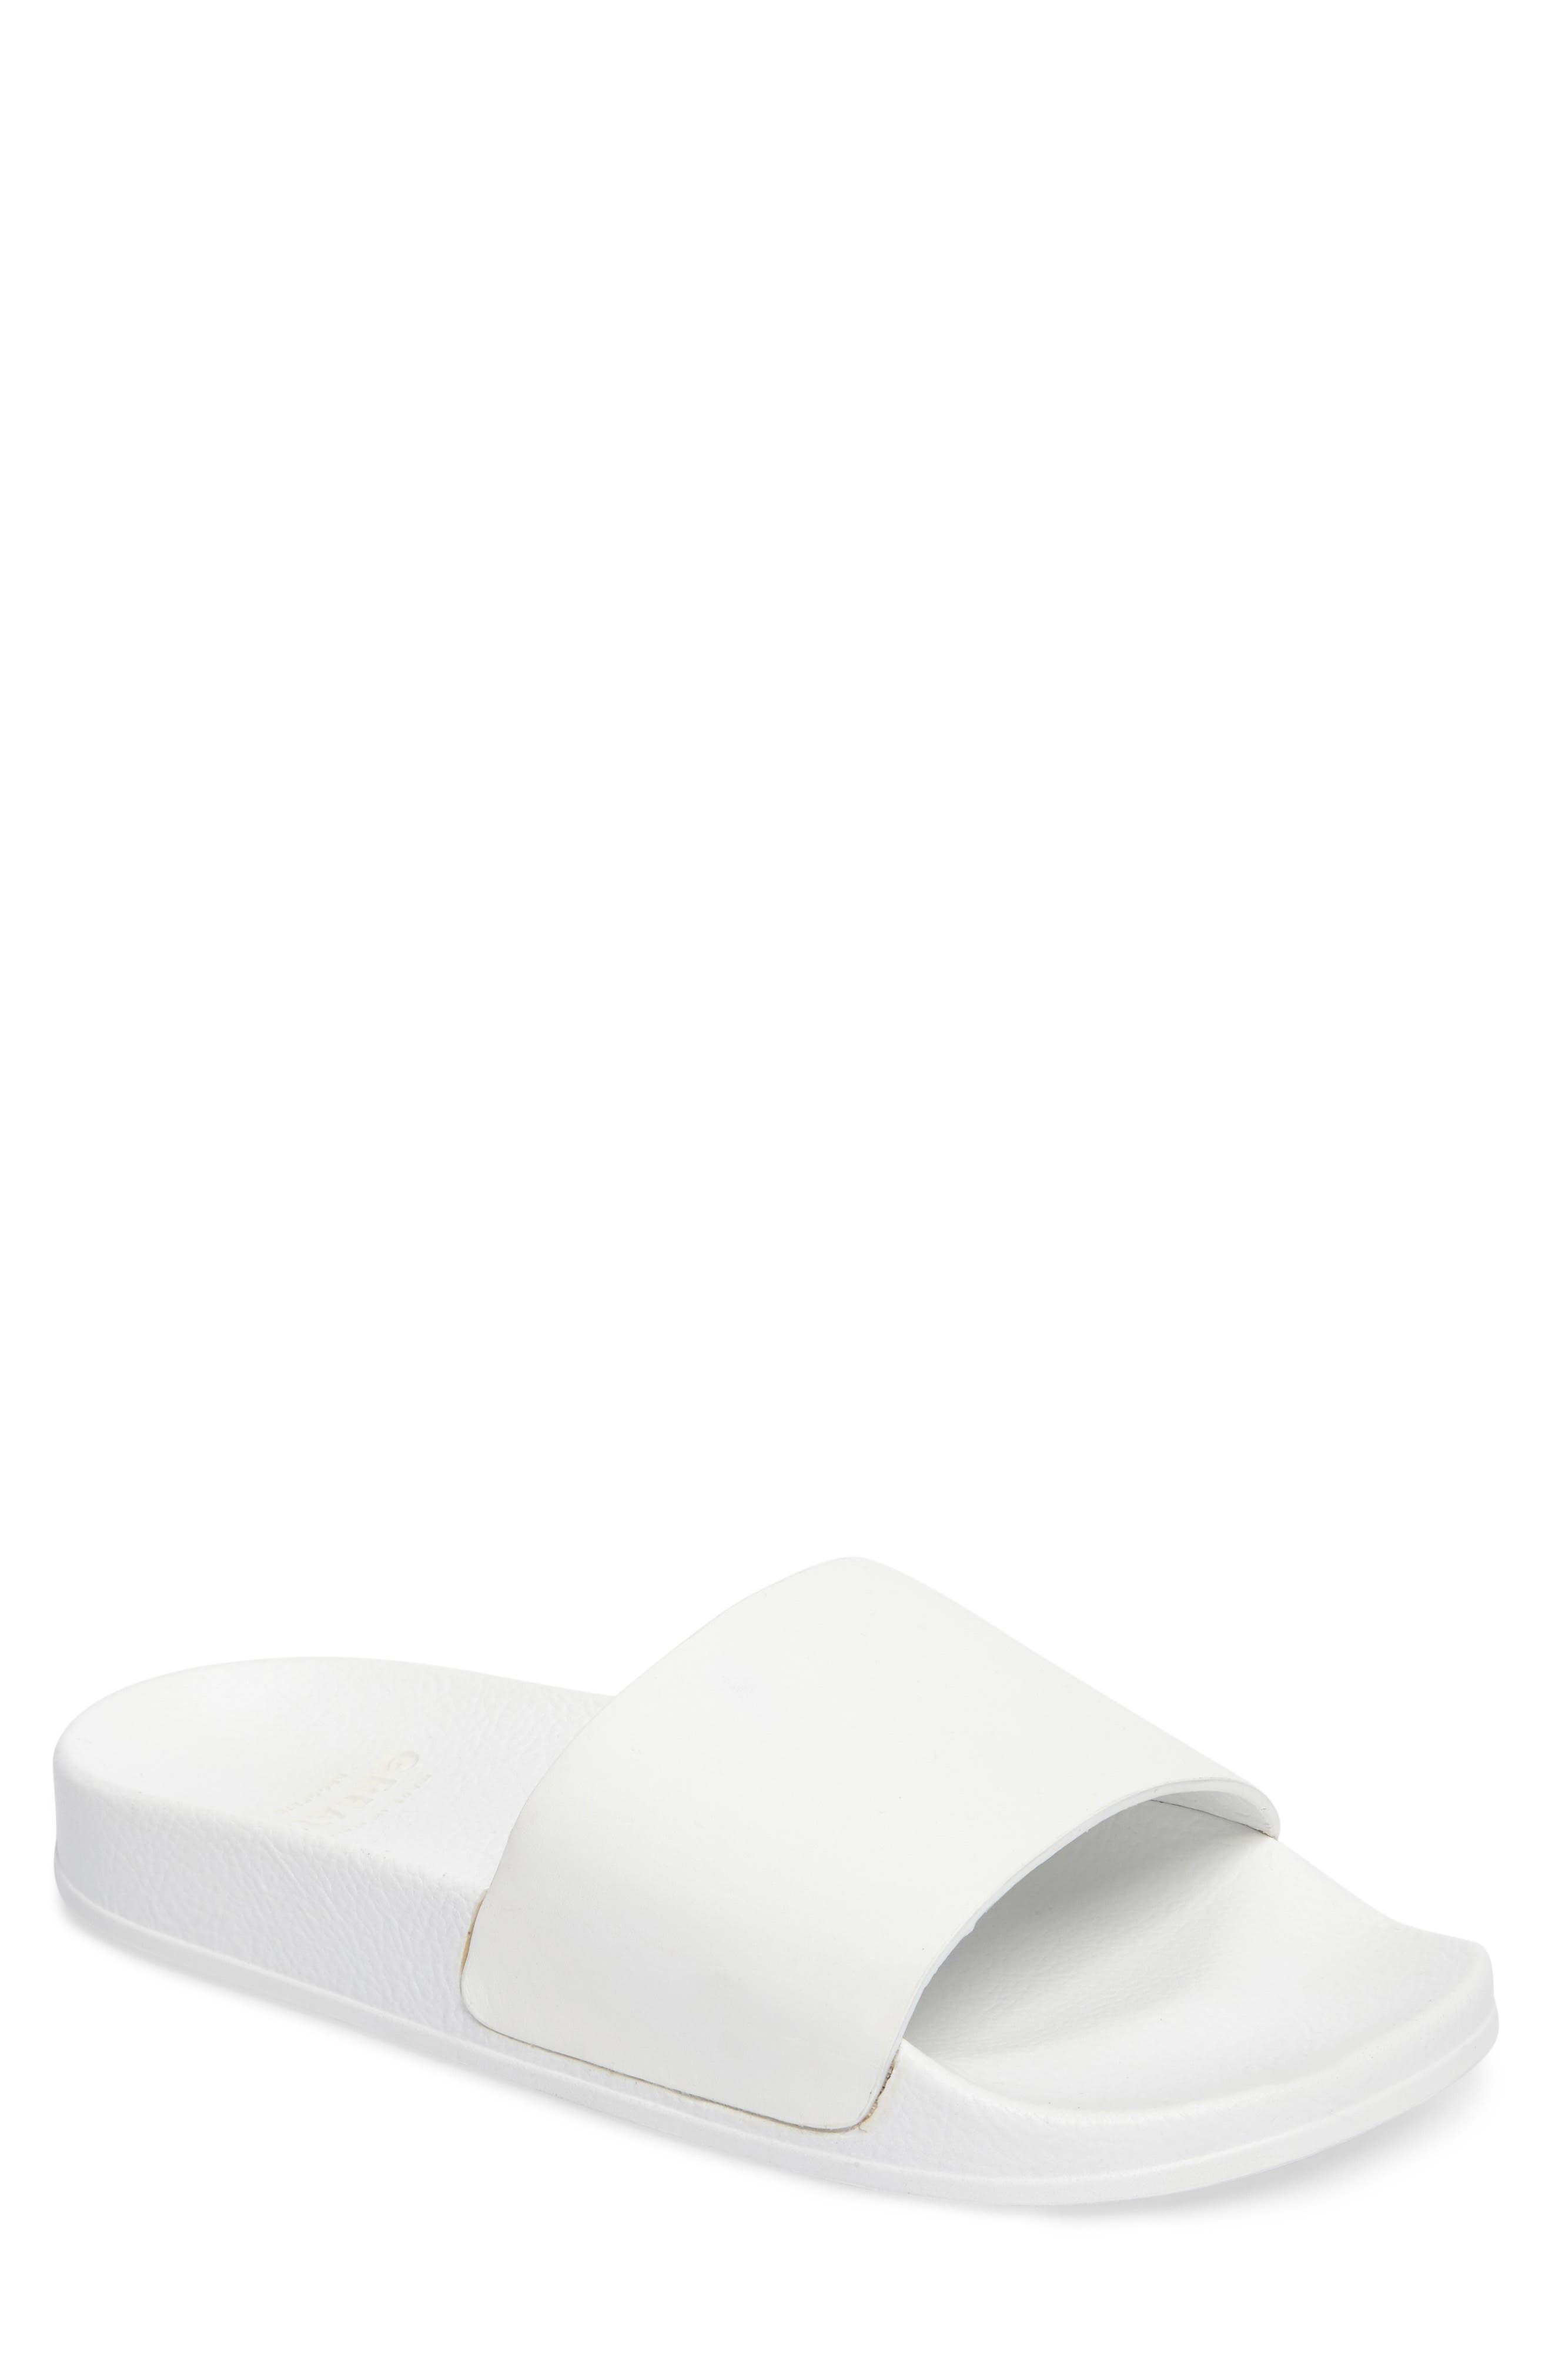 Alternate Image 1 Selected - Greats Slide Sandal (Men)